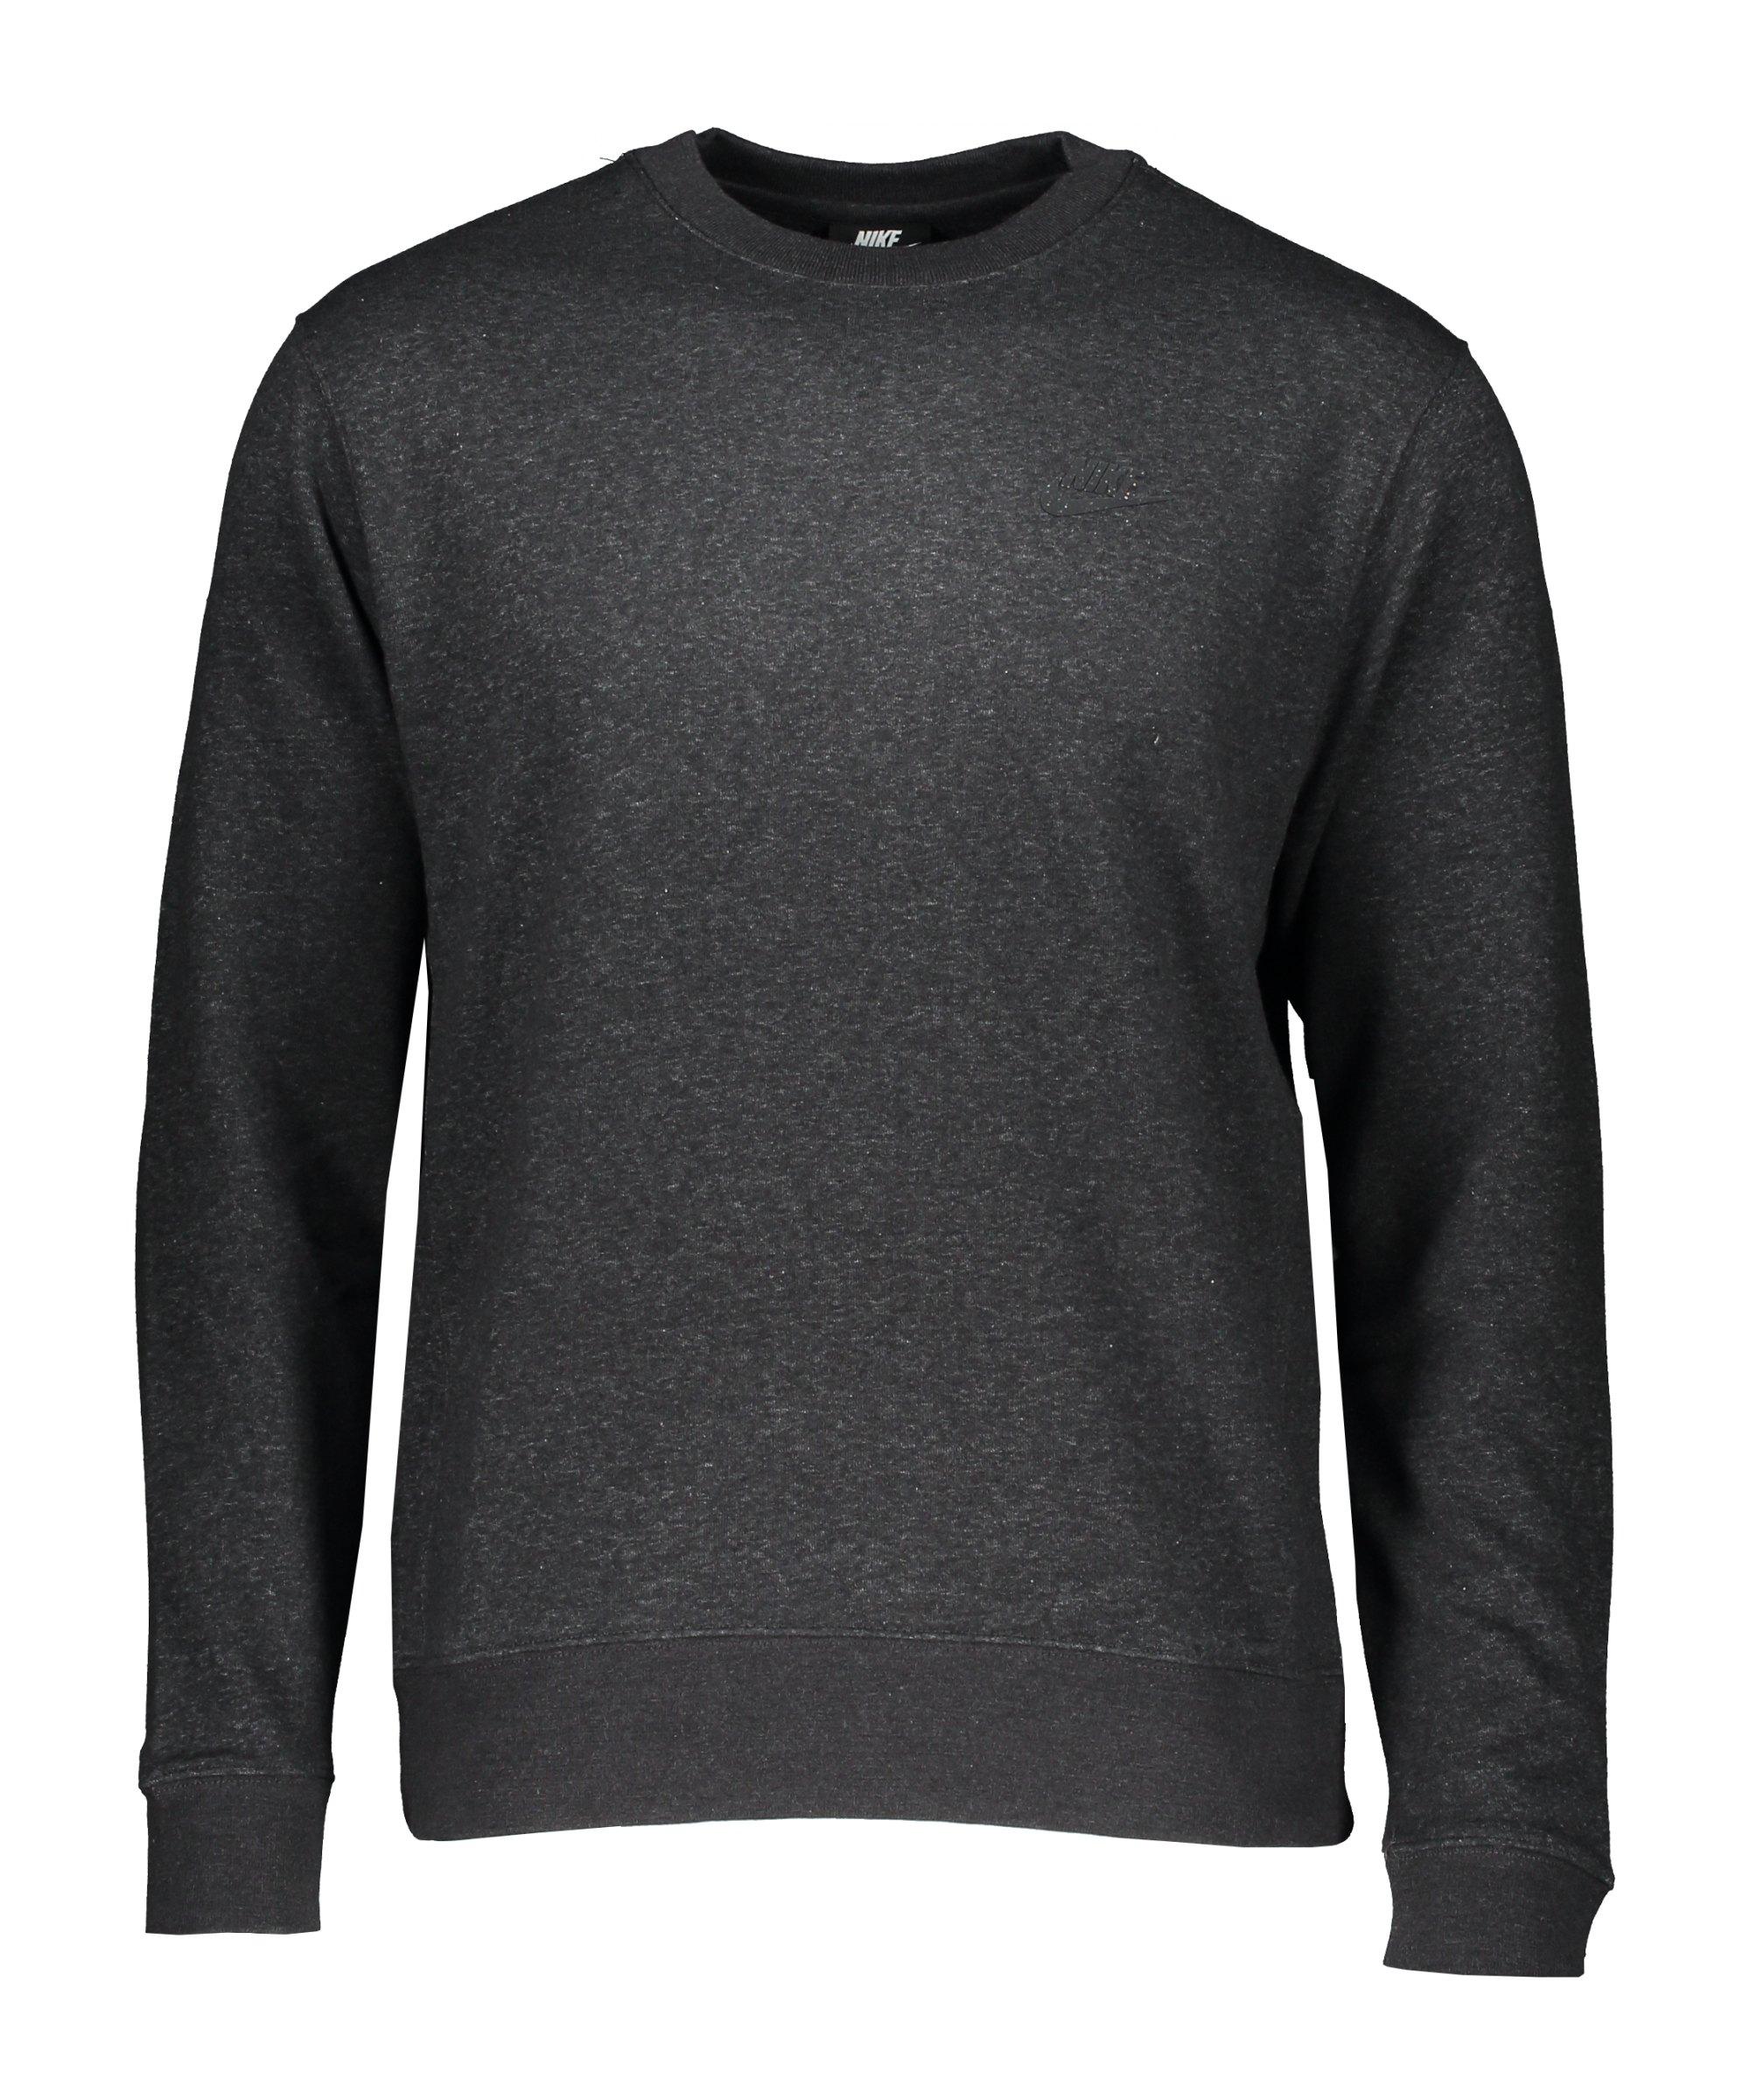 Nike Crew Revival Sweatshirt Schwarz Grau F010 - schwarz